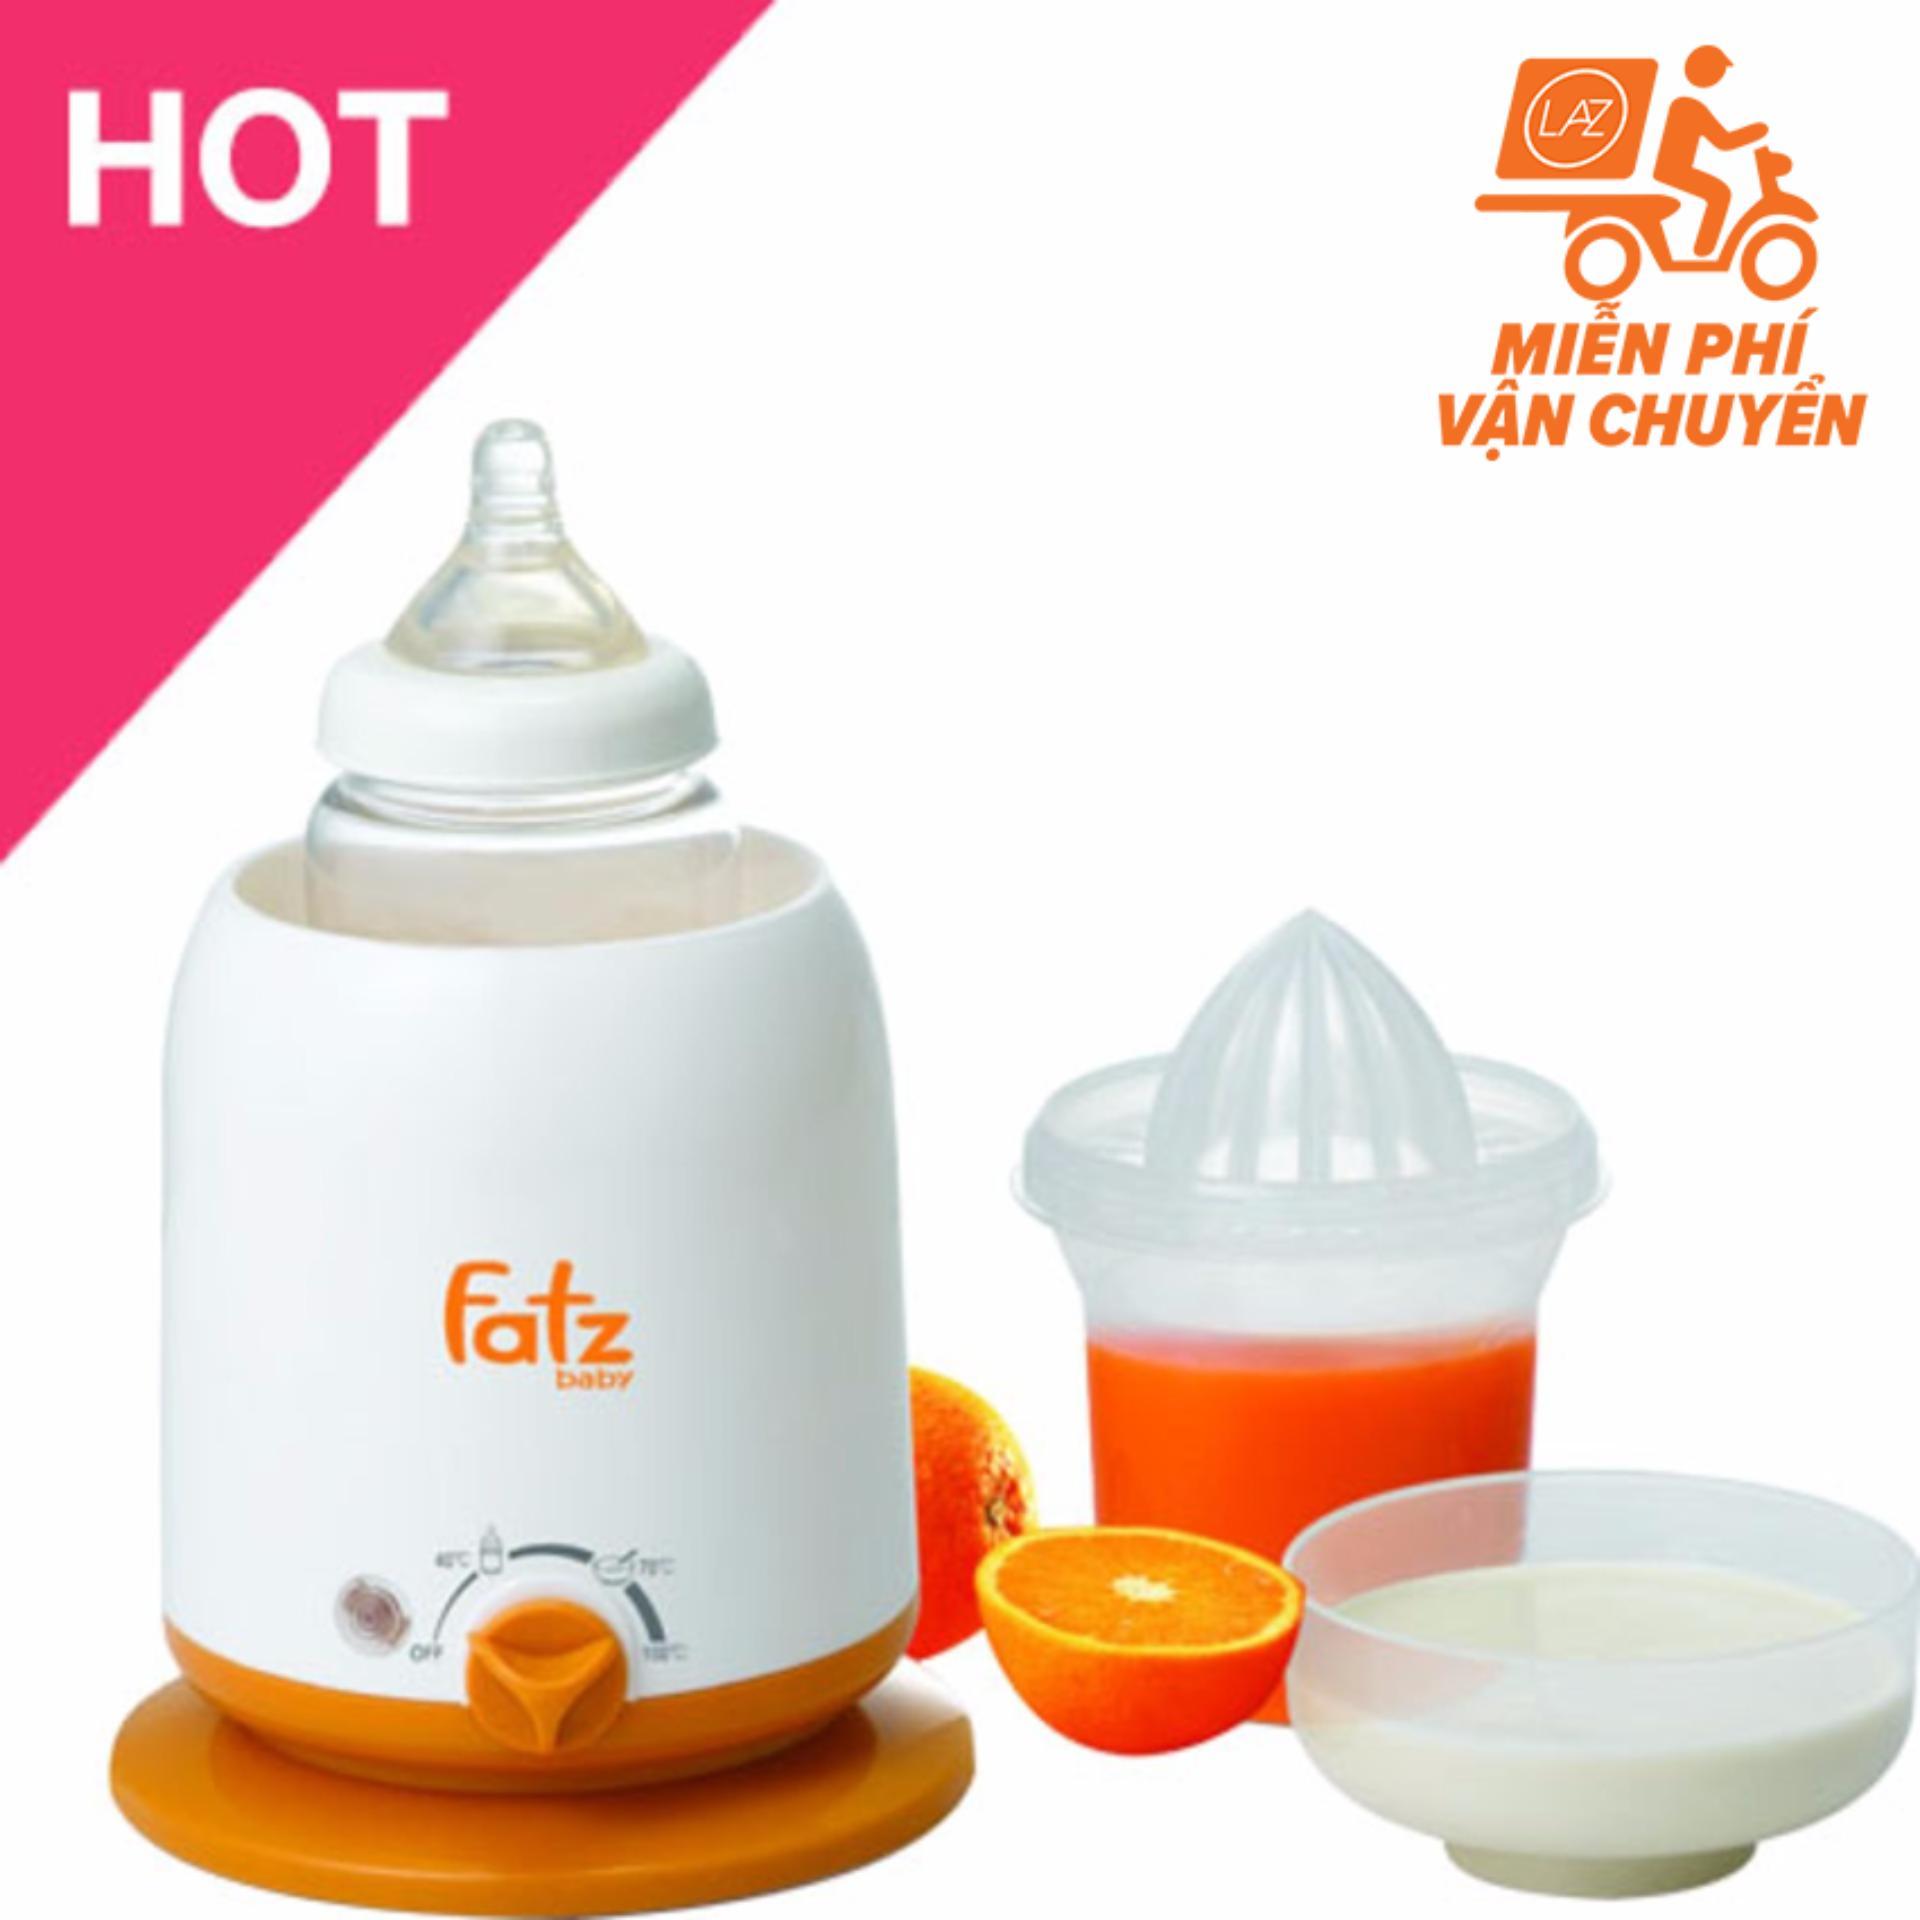 Mã Khuyến Mại May Ham Sữa Fatzbaby Fb3002Sl Trắng Phối Cam Fatzbaby